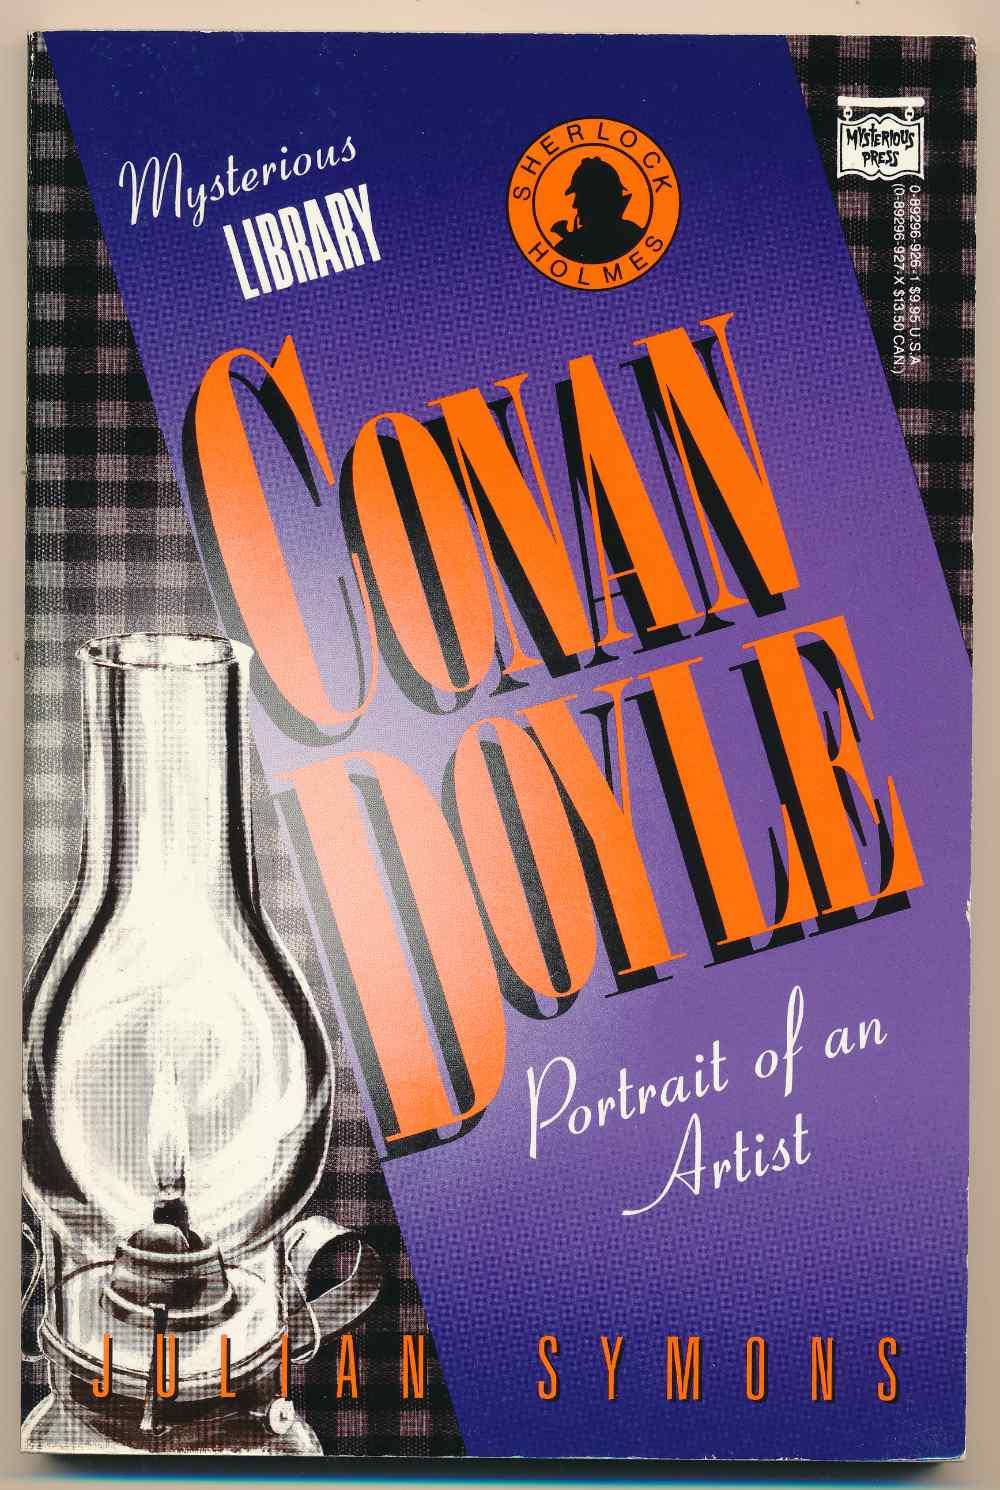 Conan Doyle : portrait of an artist